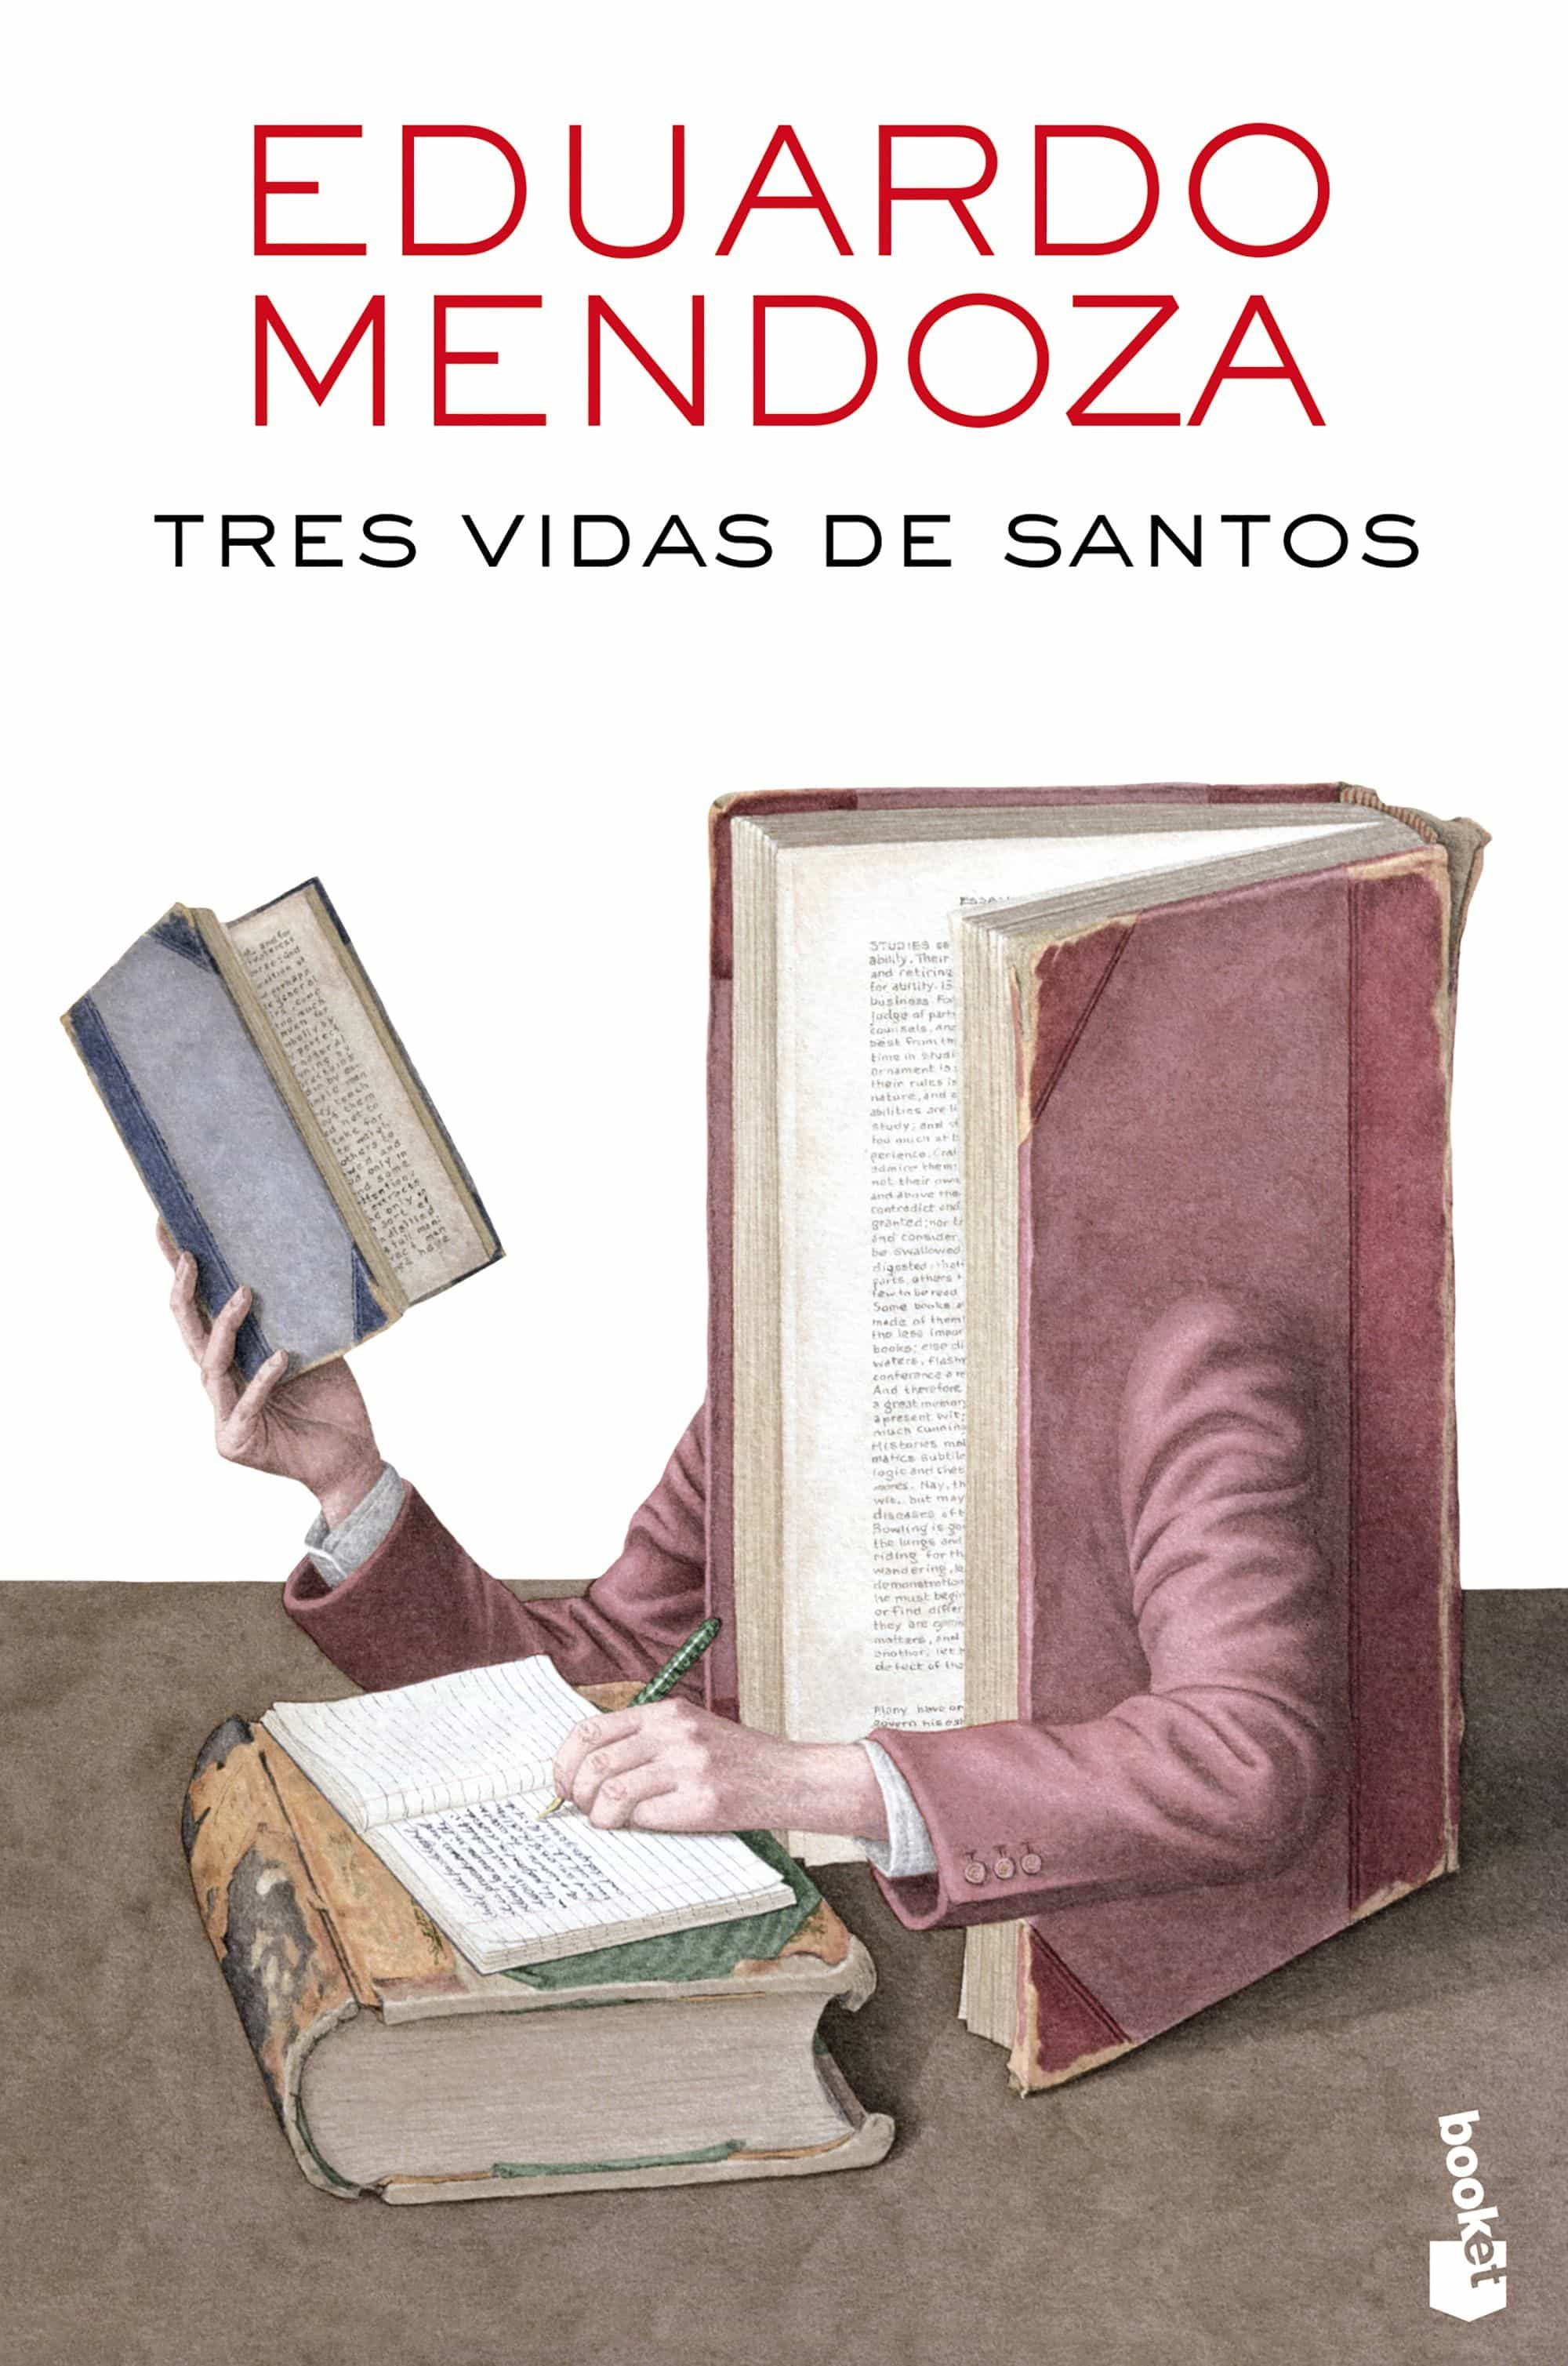 Tres vidas de santos (Biblioteca Eduardo Mendoza)